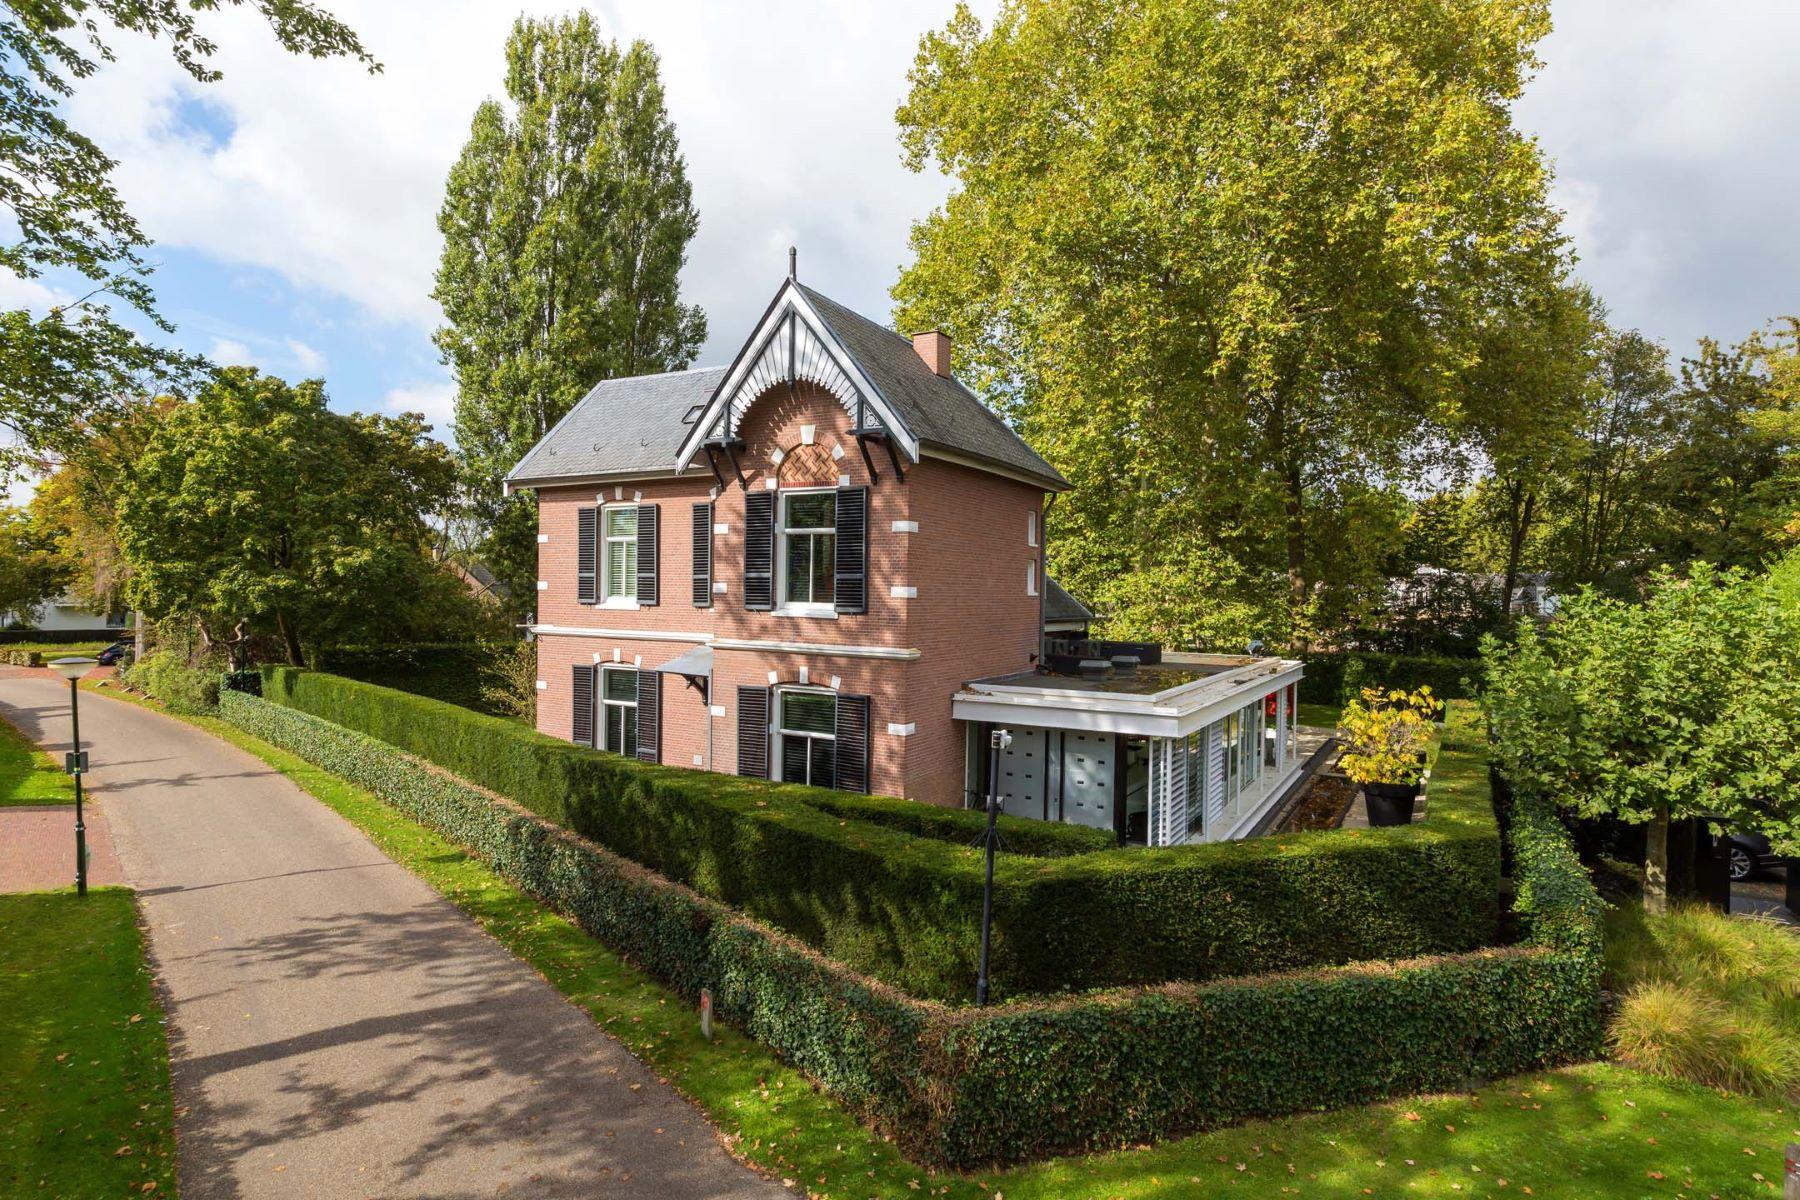 Single Family Homes for Sale at Authentic, modern villa in splendid green village Nuenen, North Brabant Netherlands